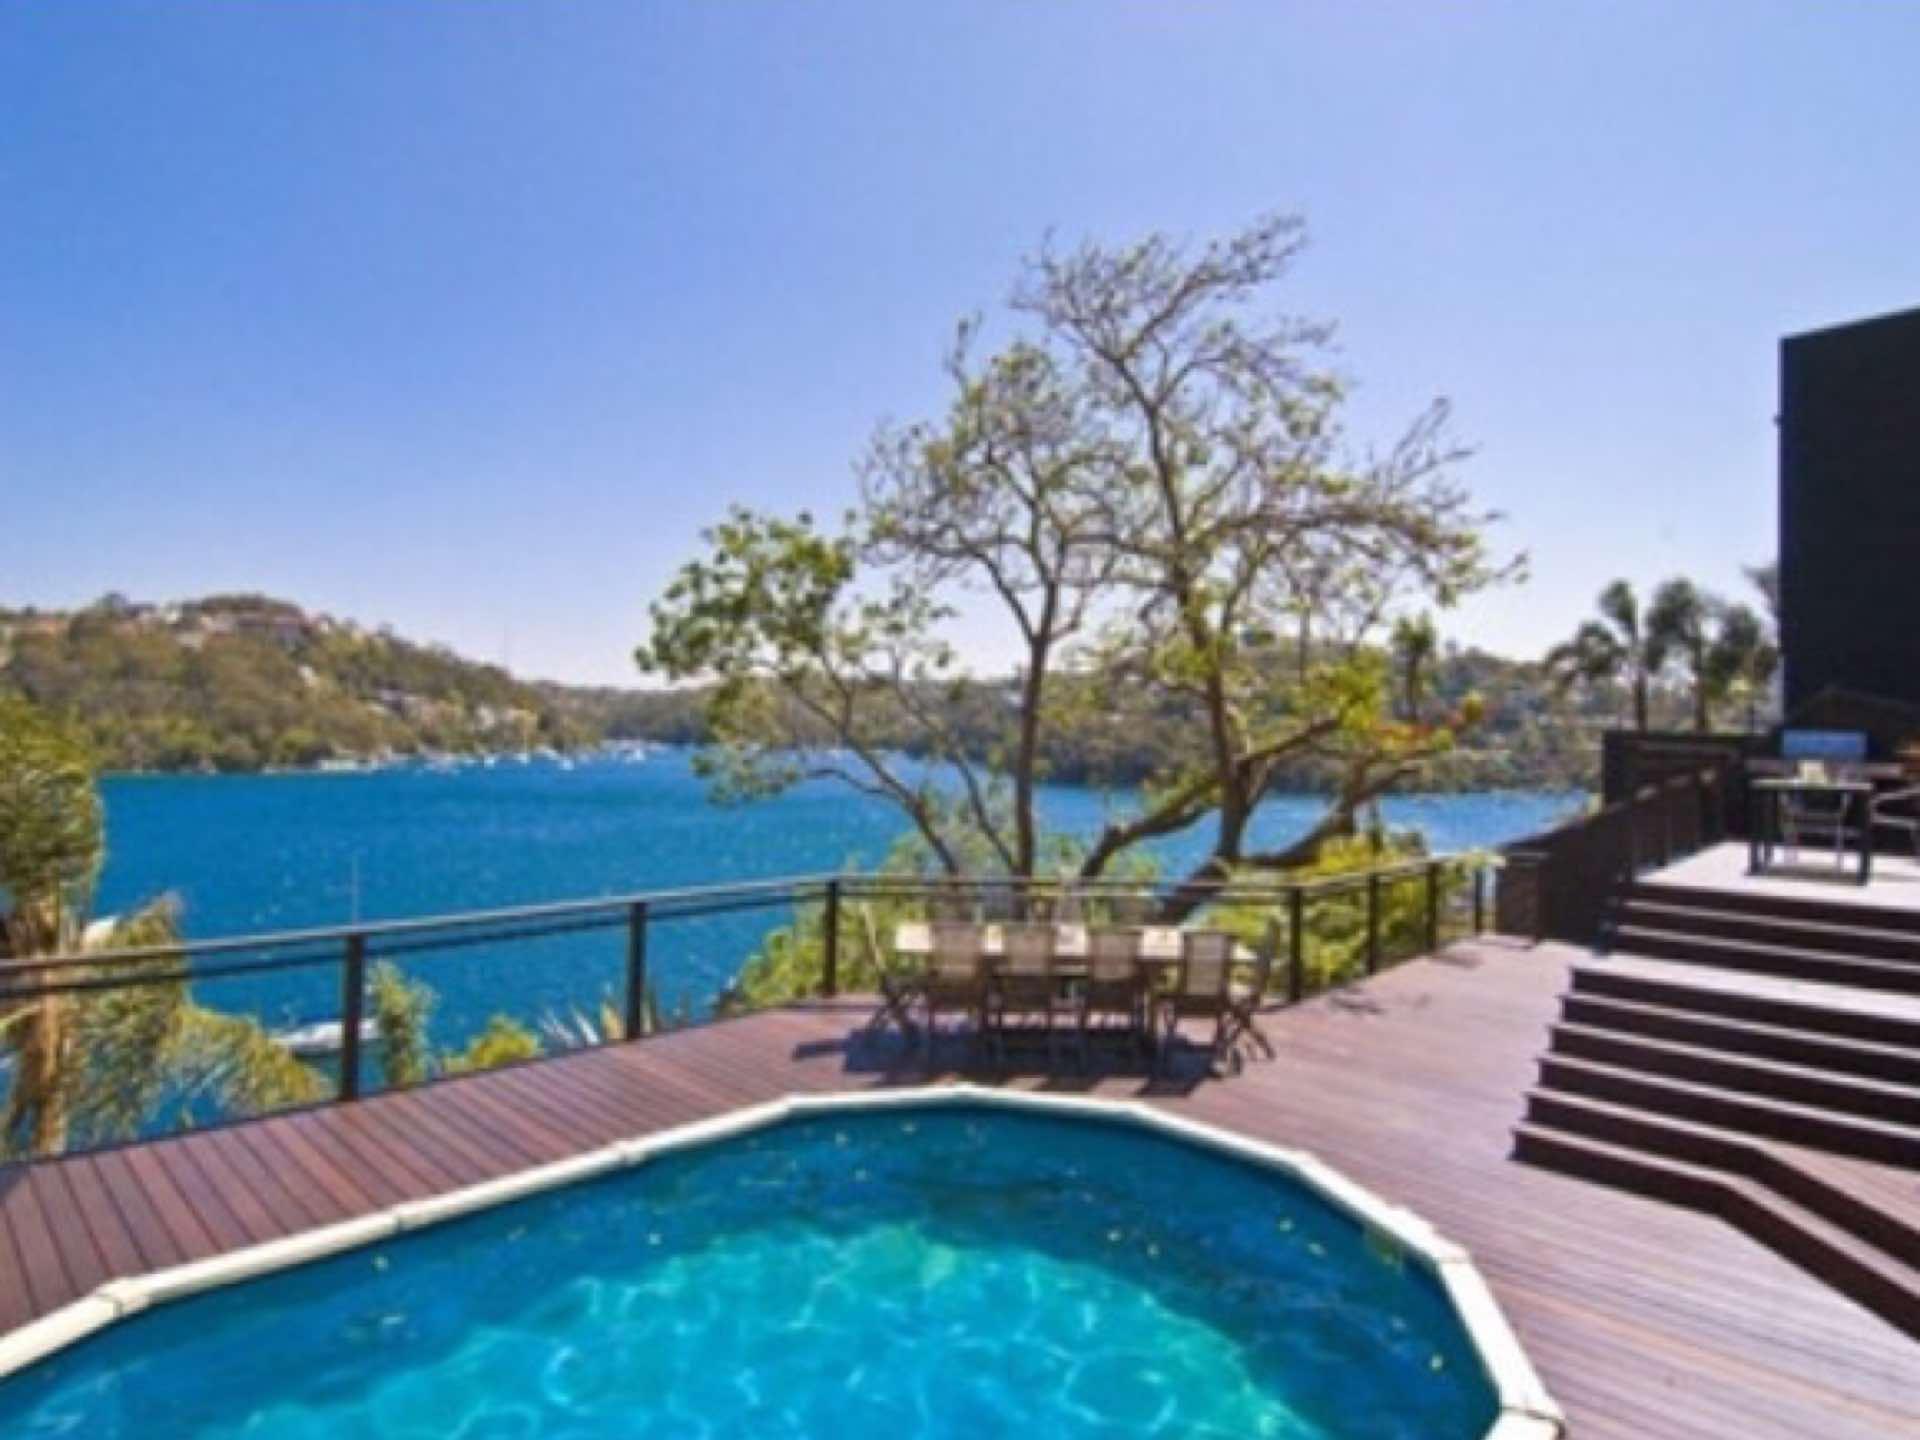 New Belian hardwood deck and stairsaround existing pool Seaforth, NSW